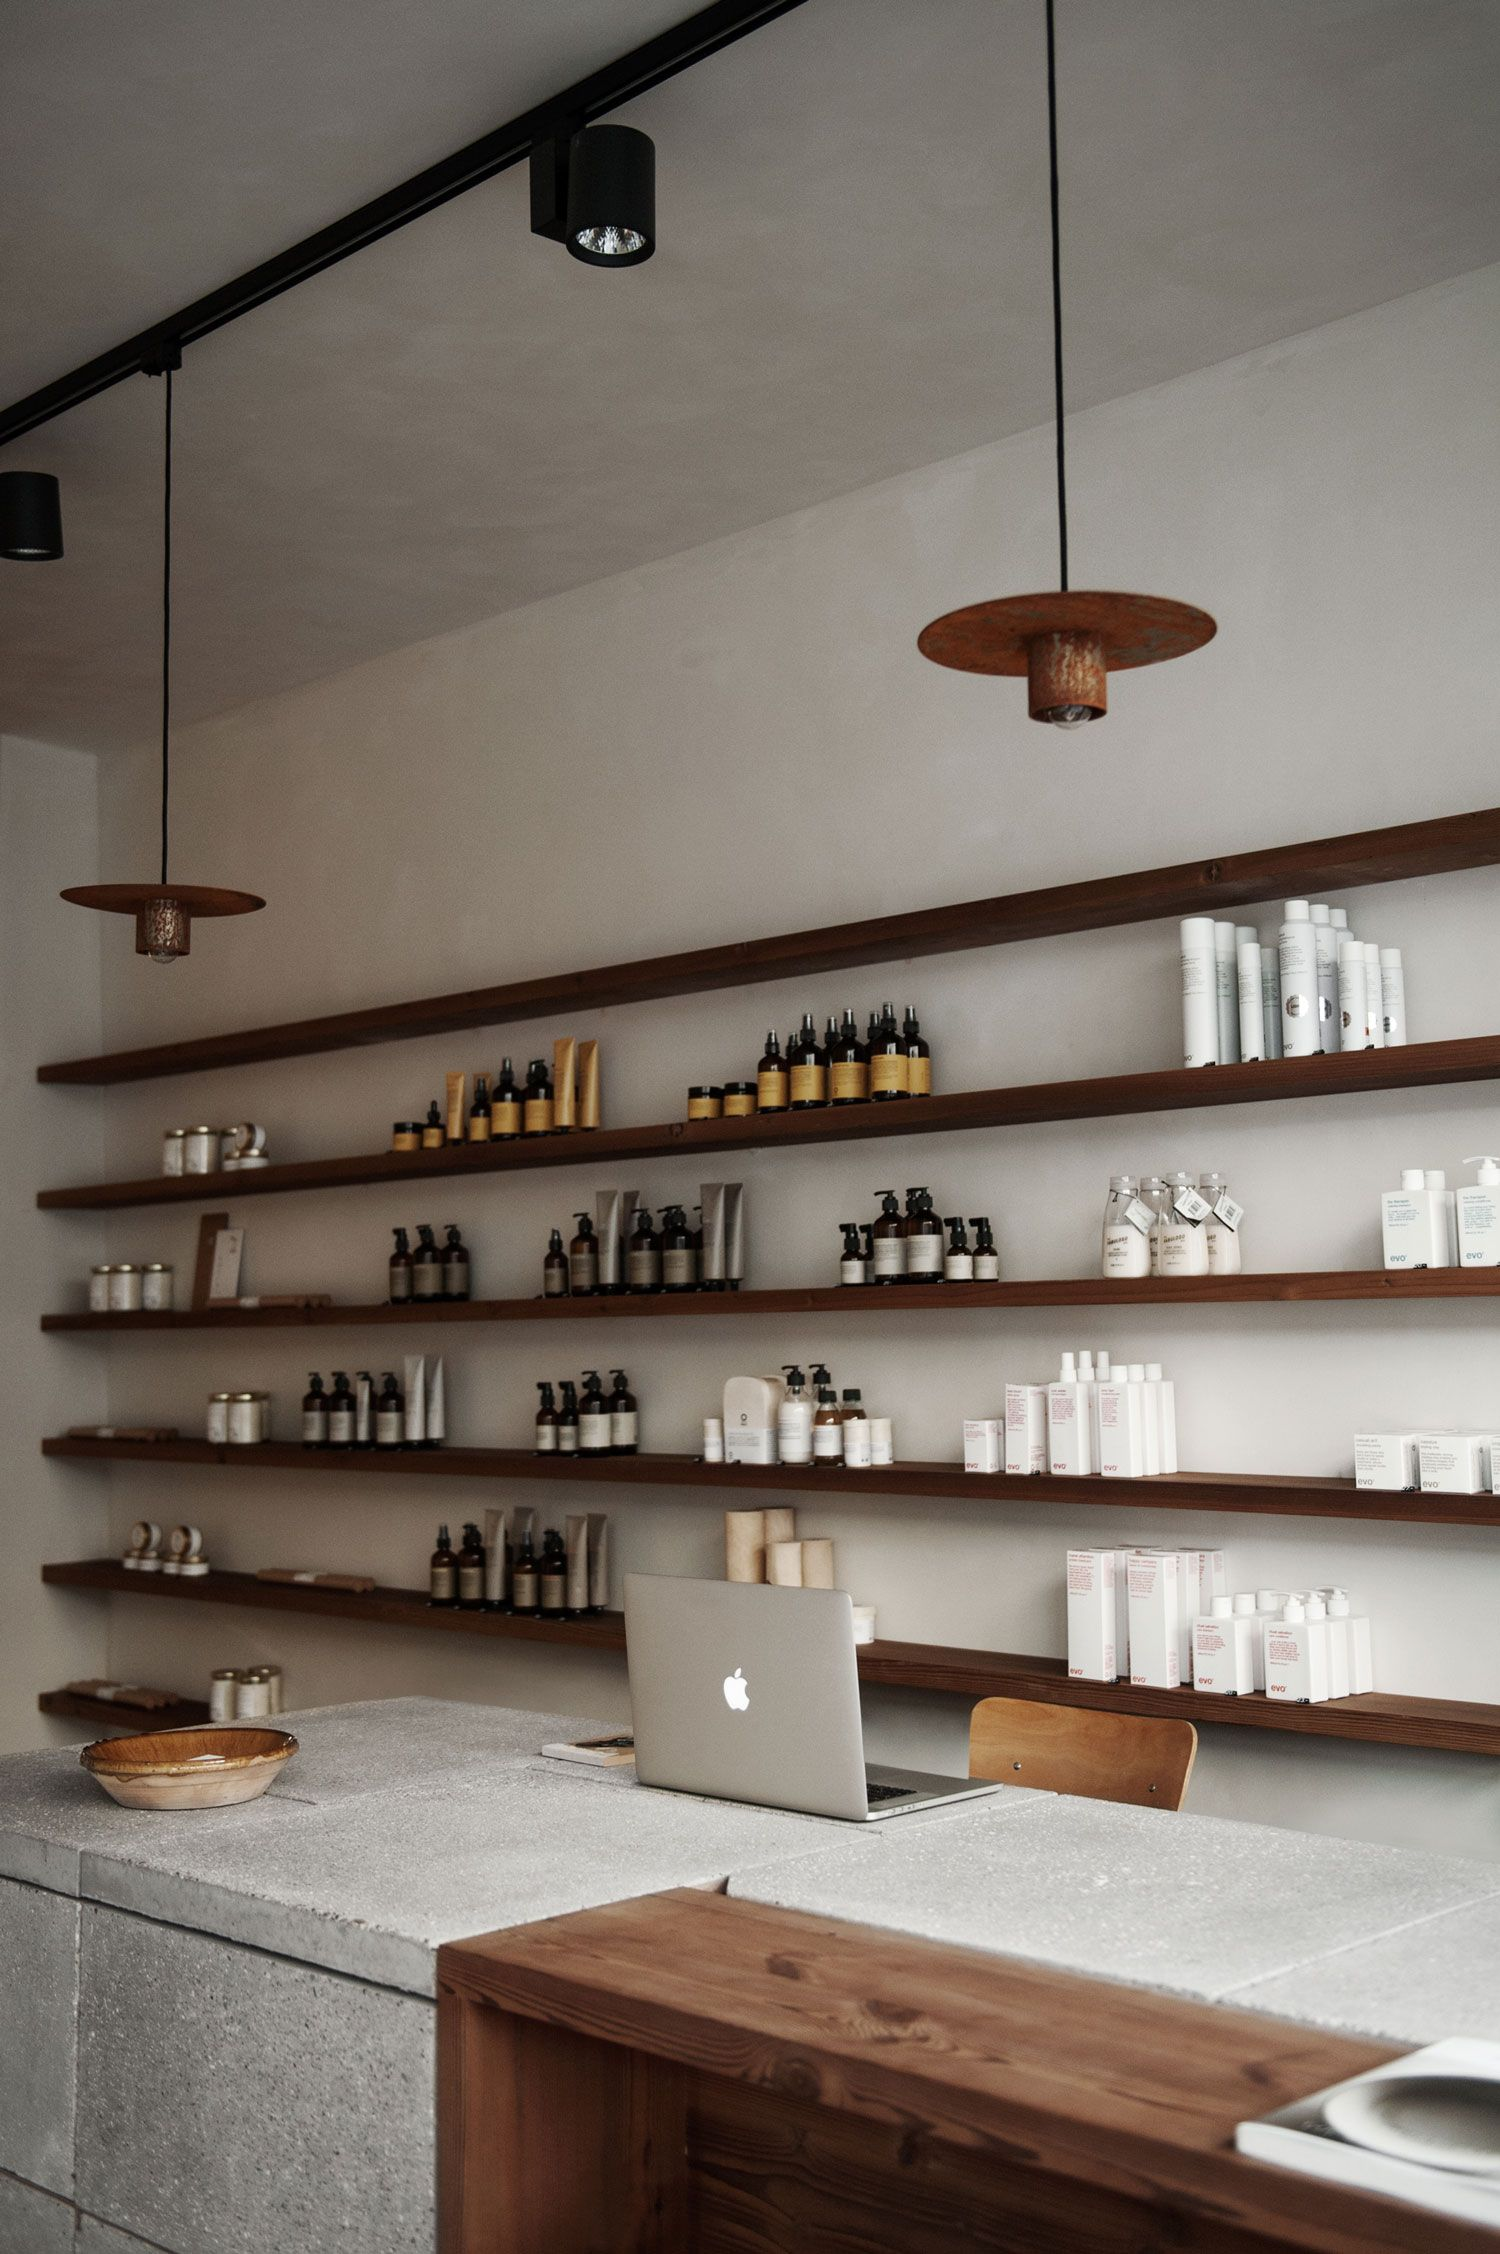 ISU Hair Salon in Antwerp Belgium by